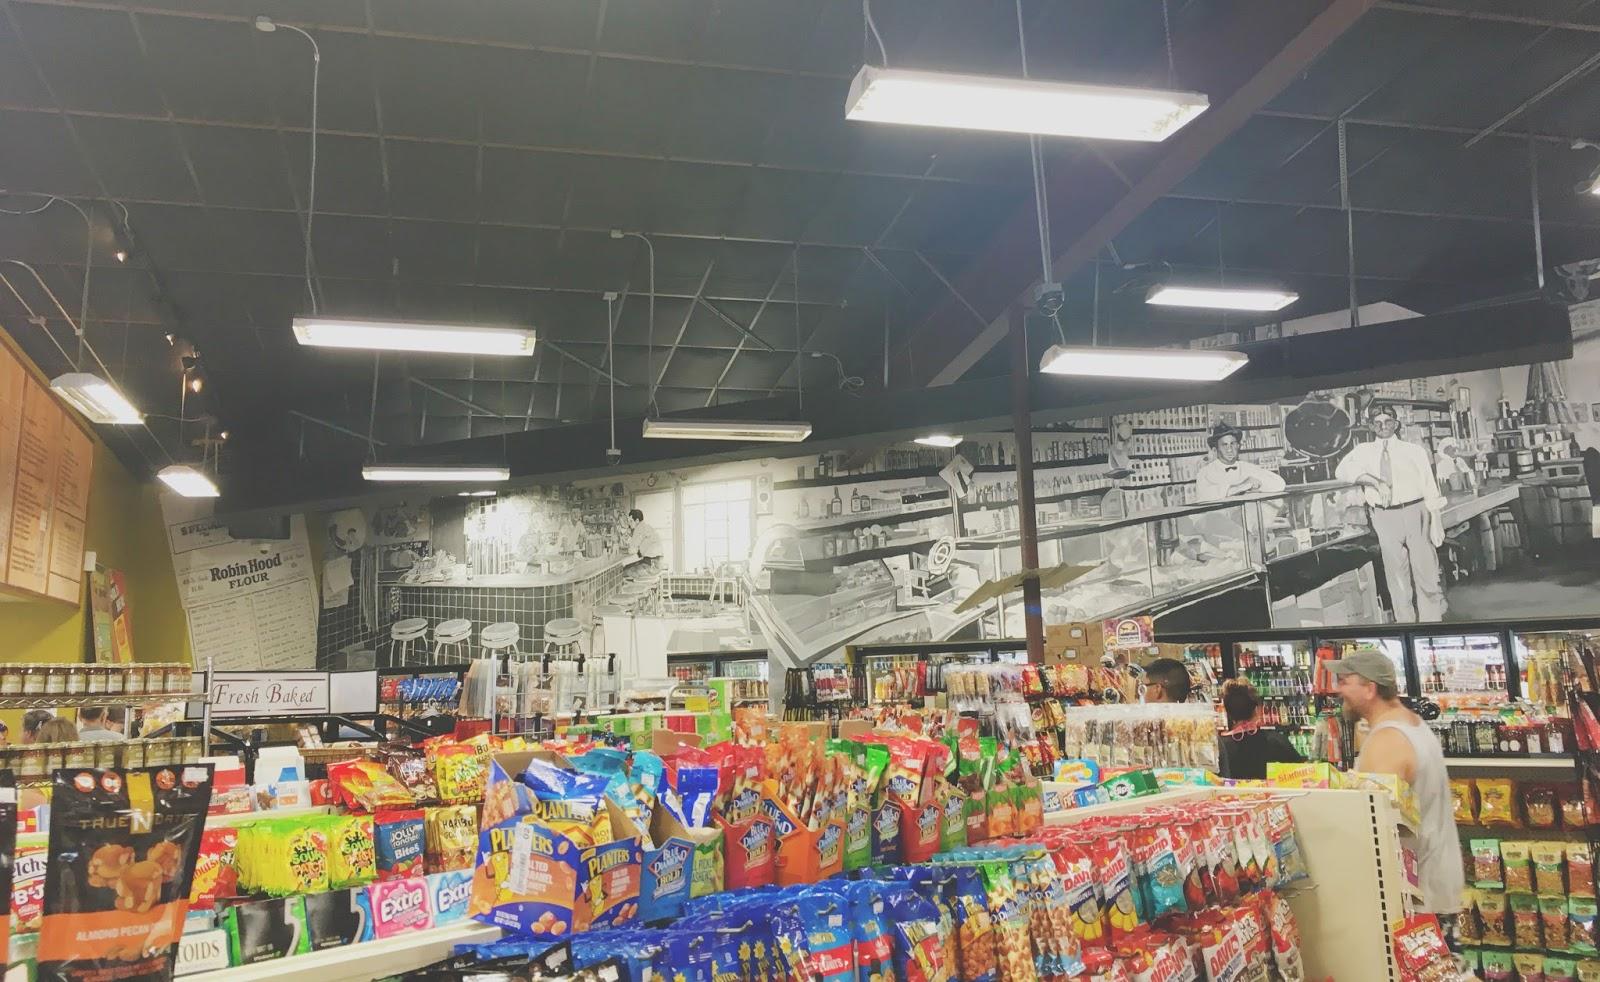 Hruska's - a convenience store near Austin, Texas